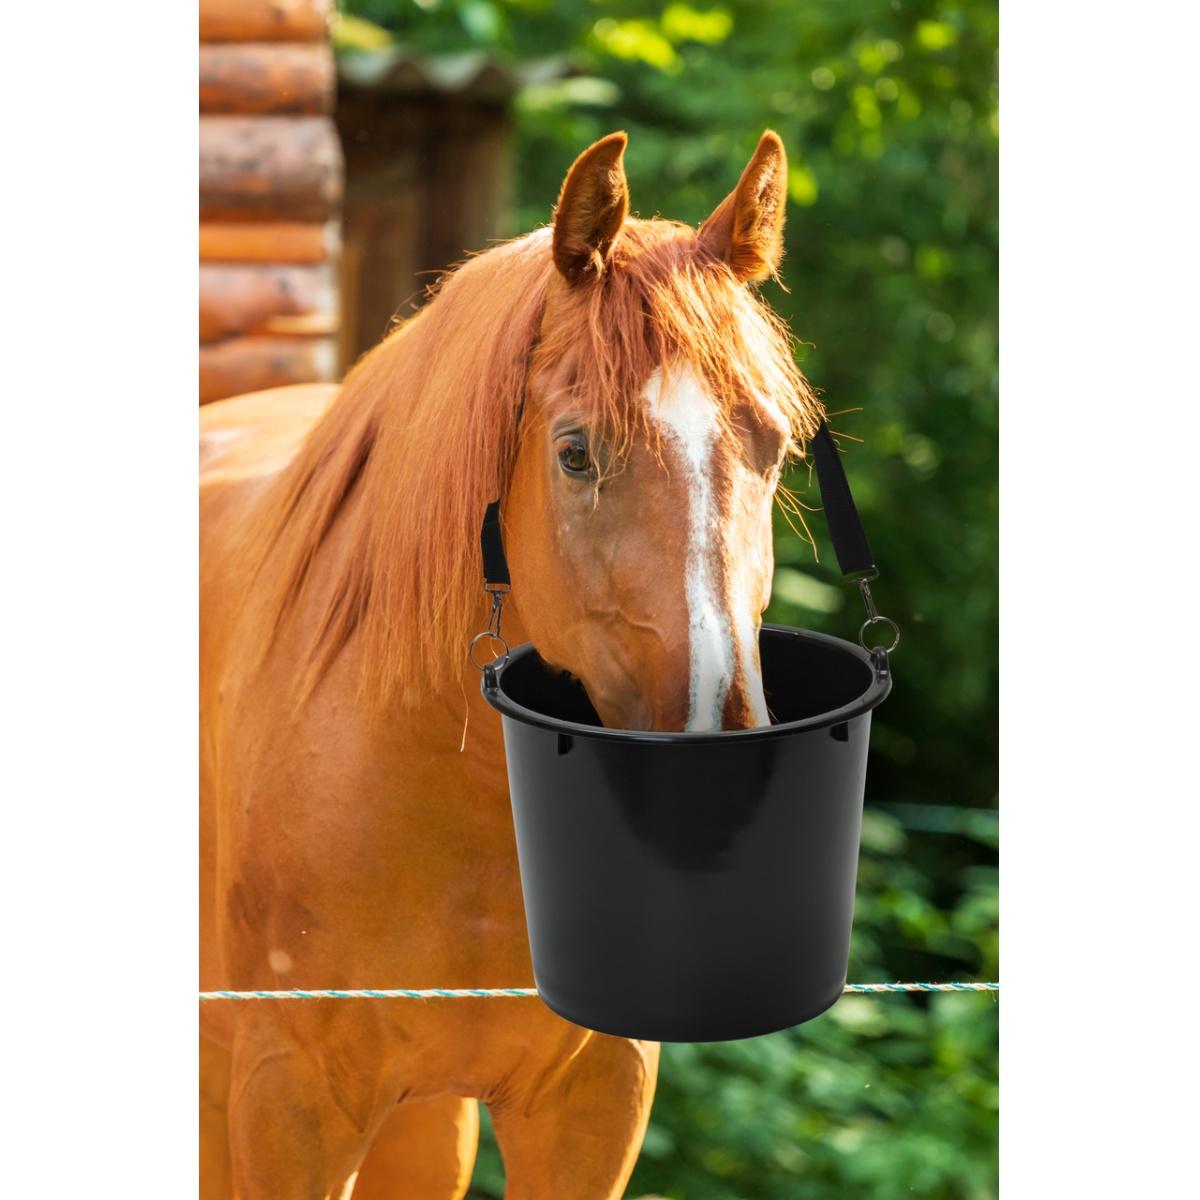 Takarmányvödör lovak számára, 12l